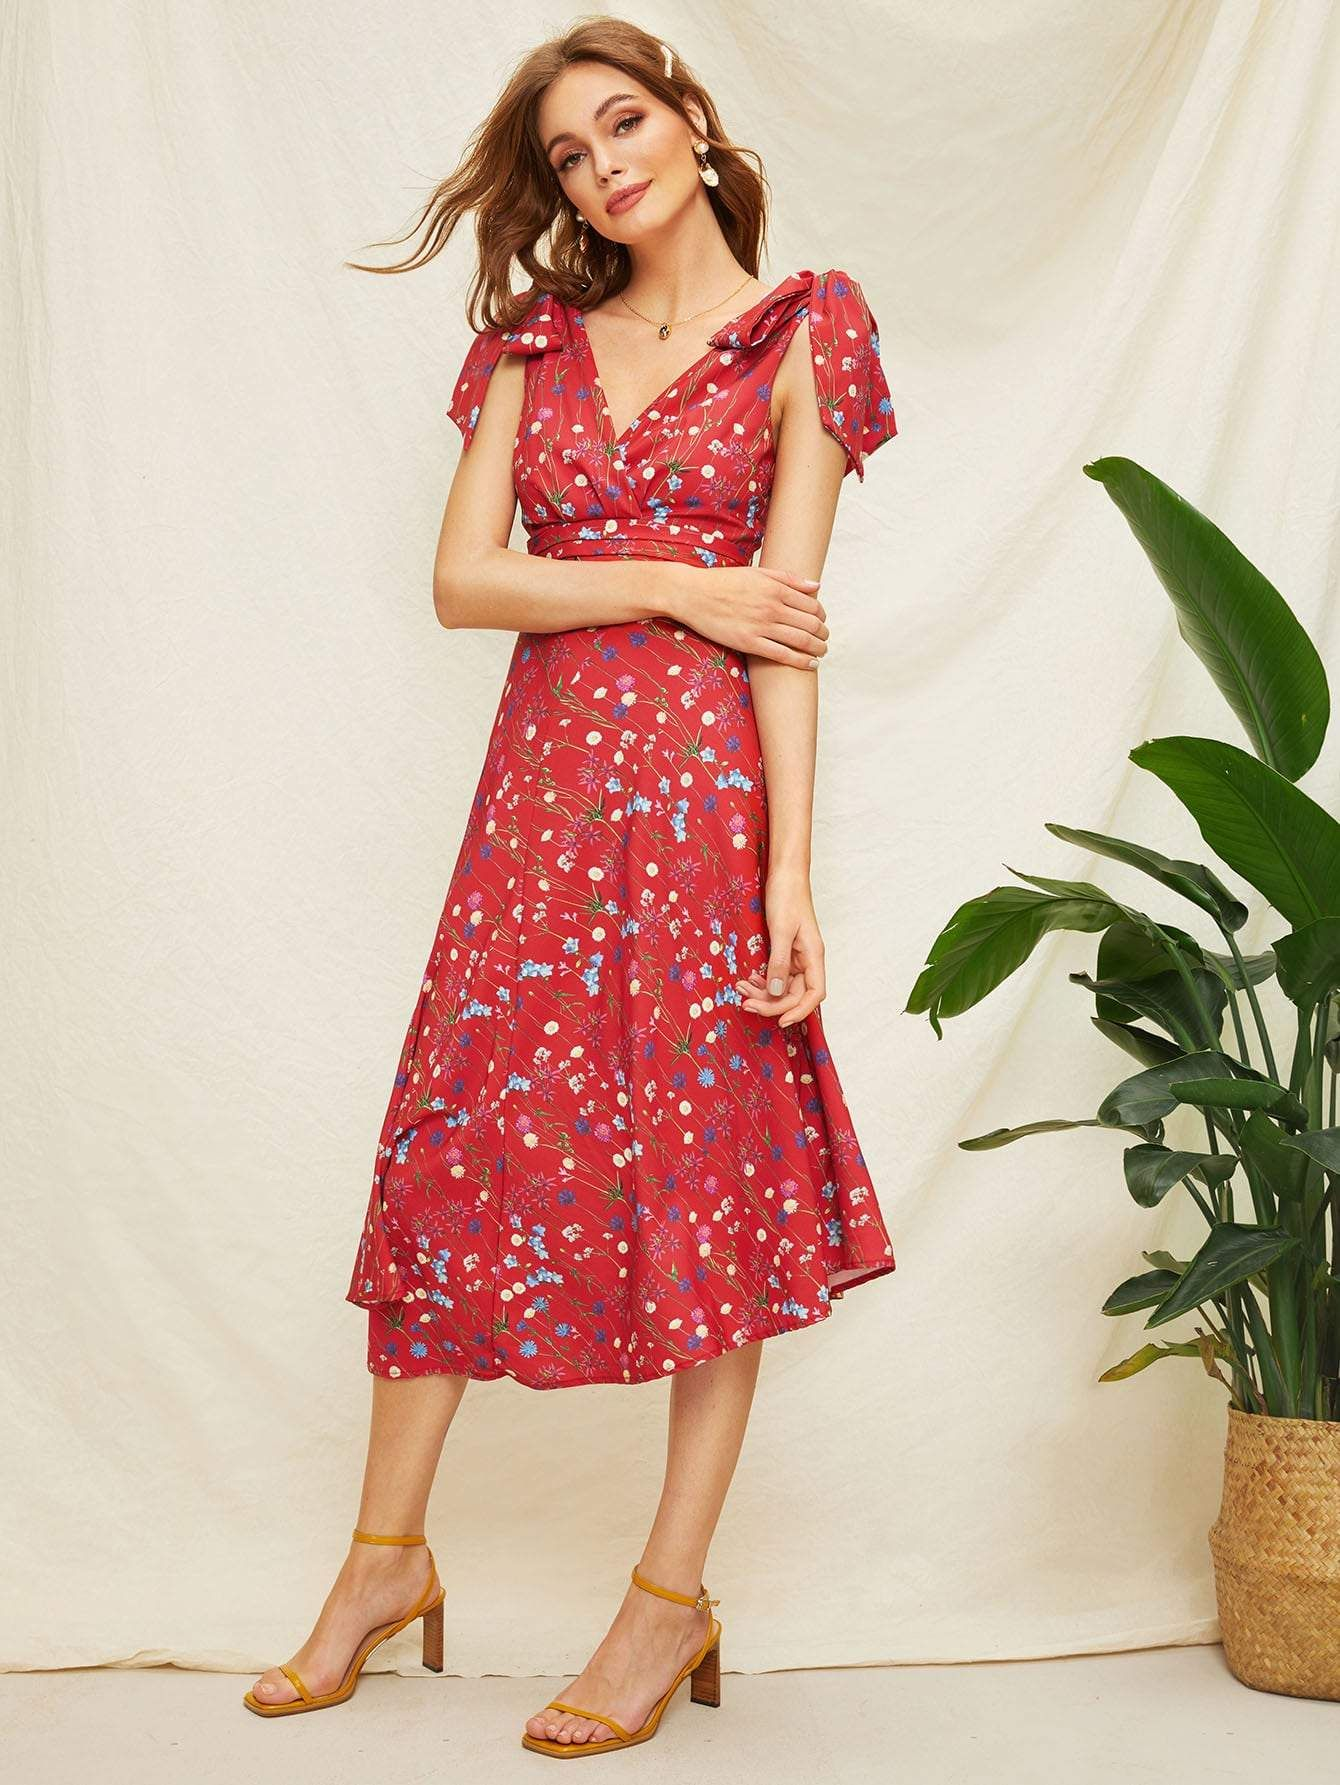 459f6c38f Knot Detail Floral Print Asymmetric Hem Summer Boho Maxi Dress - Popviva # summer #year